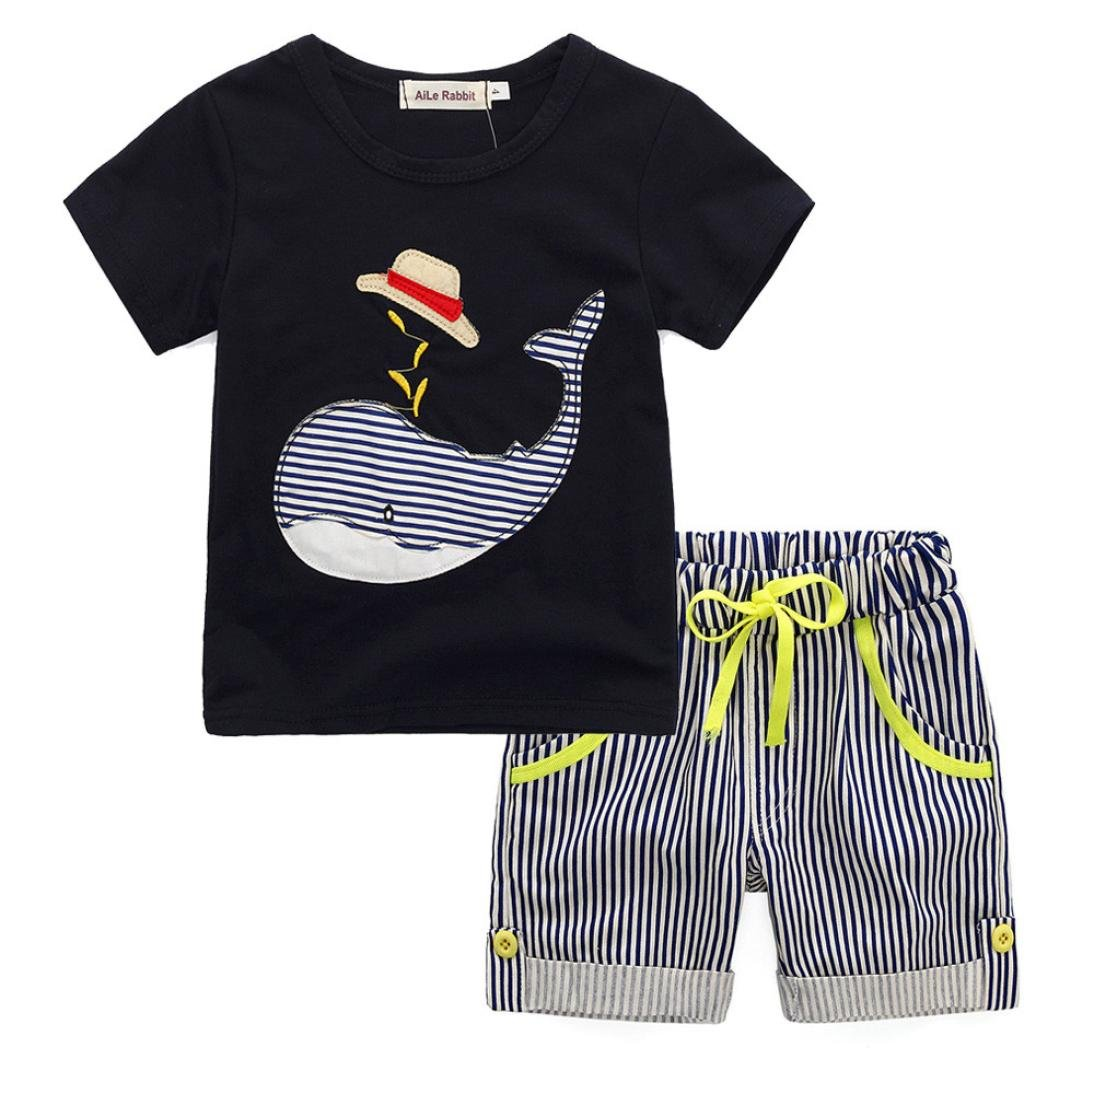 ba5922475bf0 Amazon.com  Toddler Kids Baby Boy Summer Cartoon T-shirt Top+Striped Short  Pants Outfit Clothes 2Pcs Set  Clothing